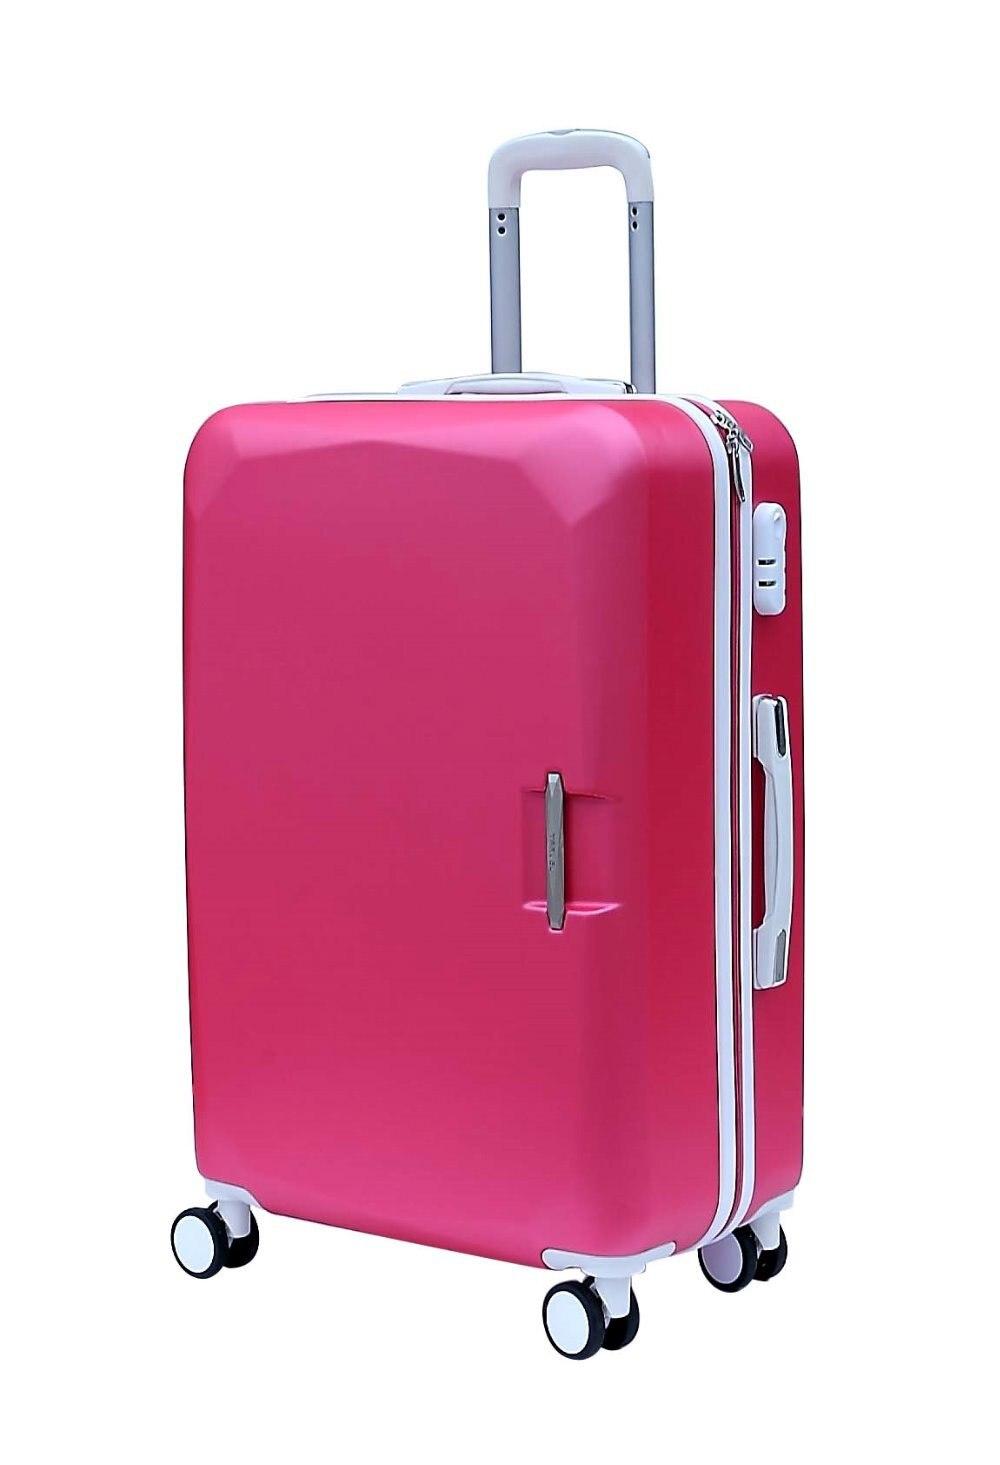 Trolley case,Cabin Luggage,Cabin bag, Cabin trolley case , Delsey ...